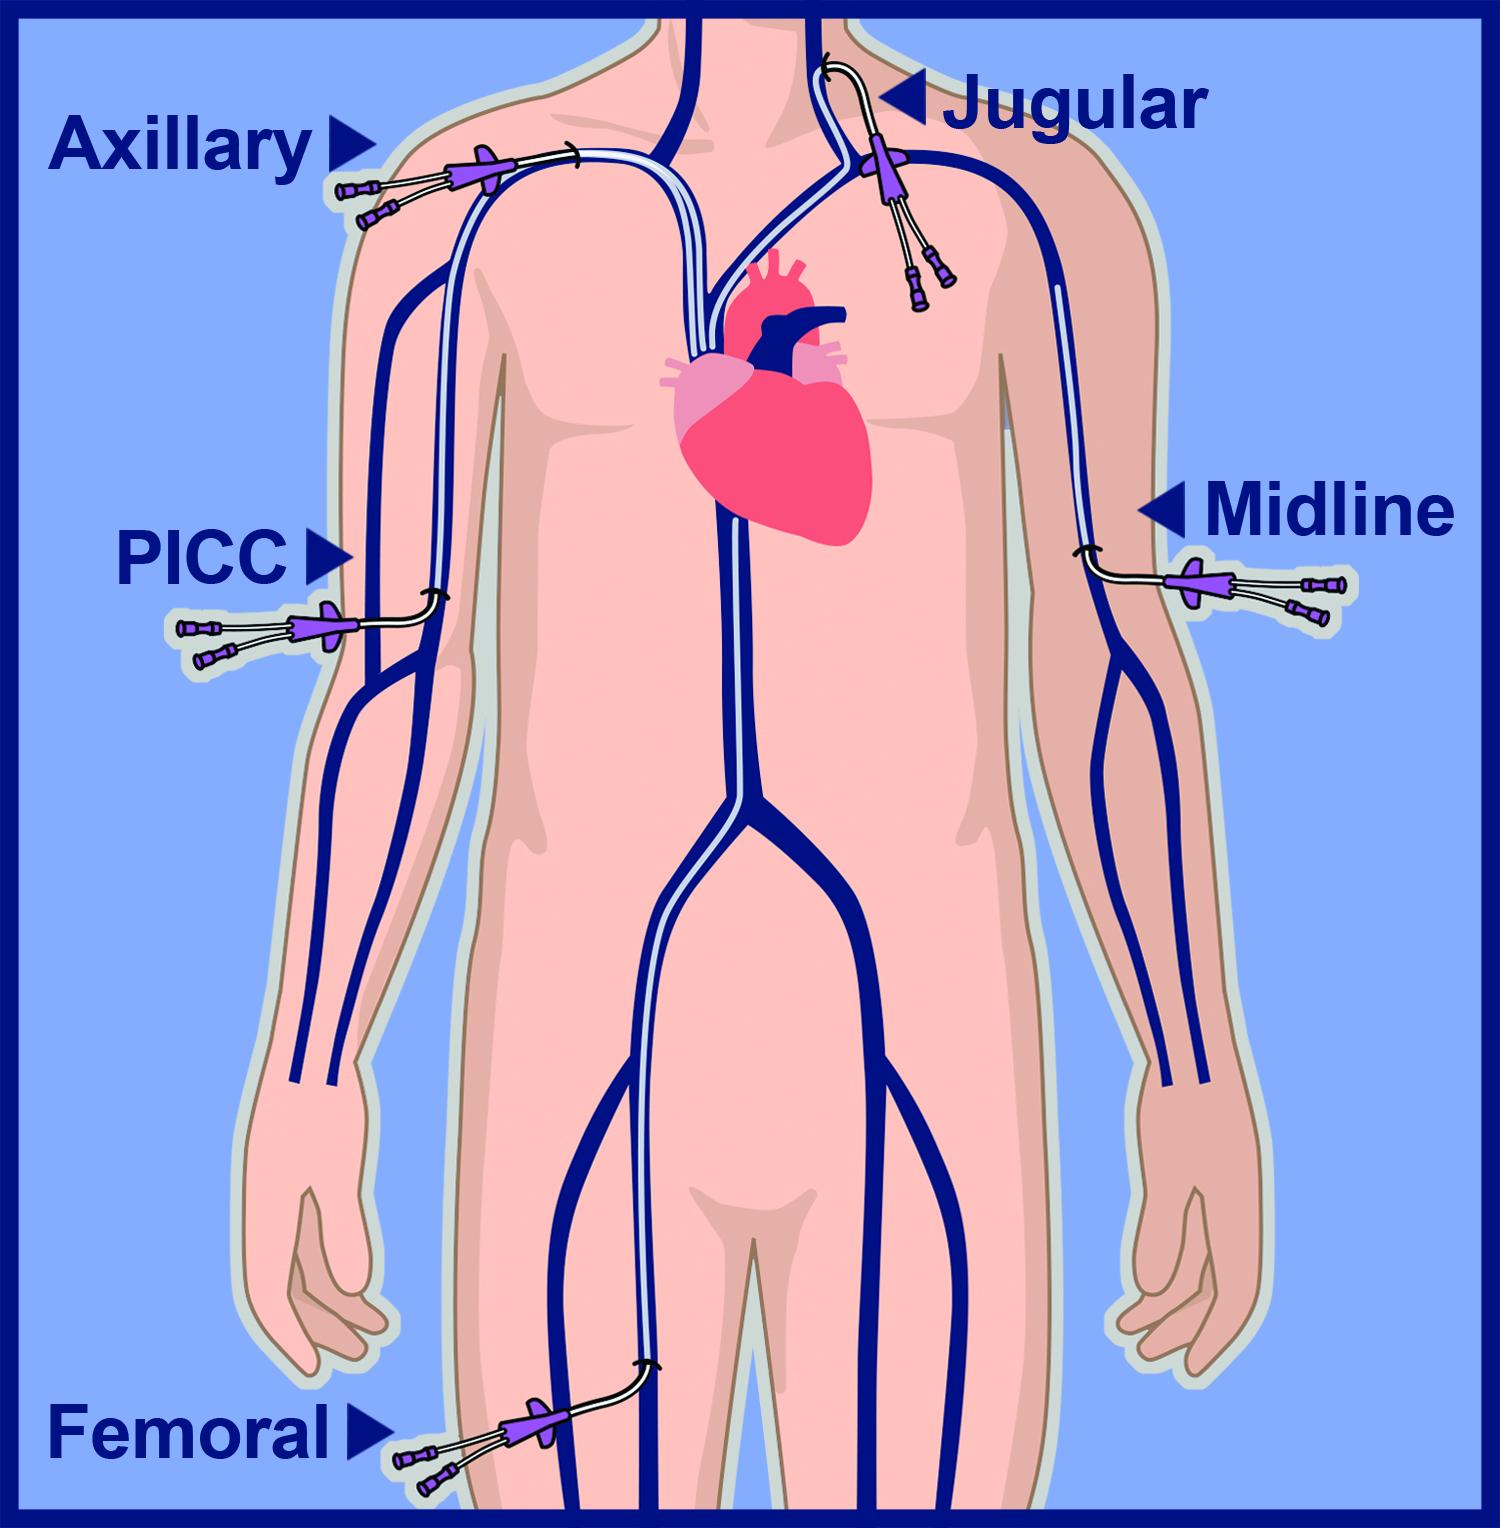 Central Venous Catheters & Midline Catheter (non-central)